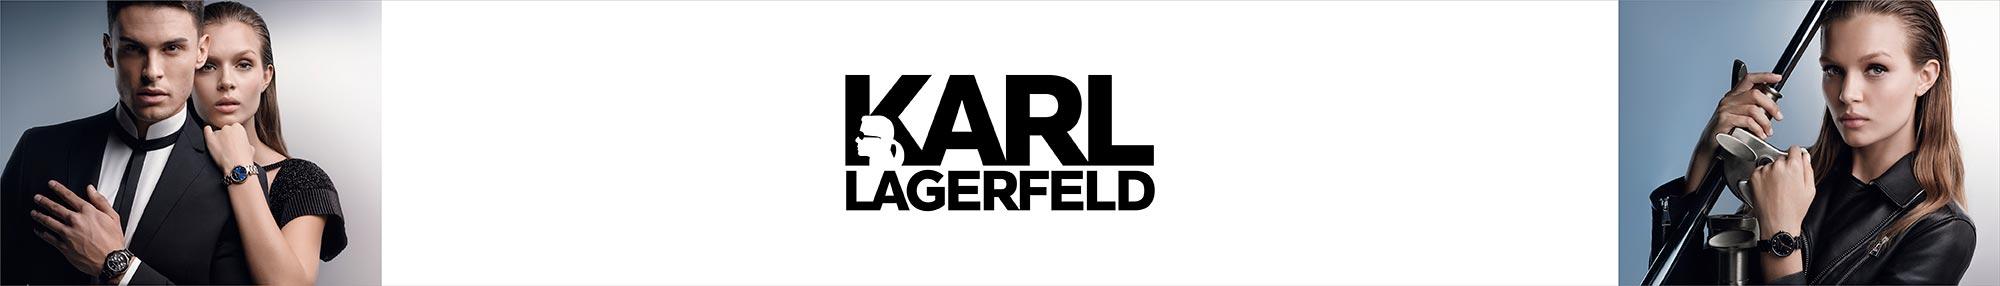 Montre Karl Lagerfeld